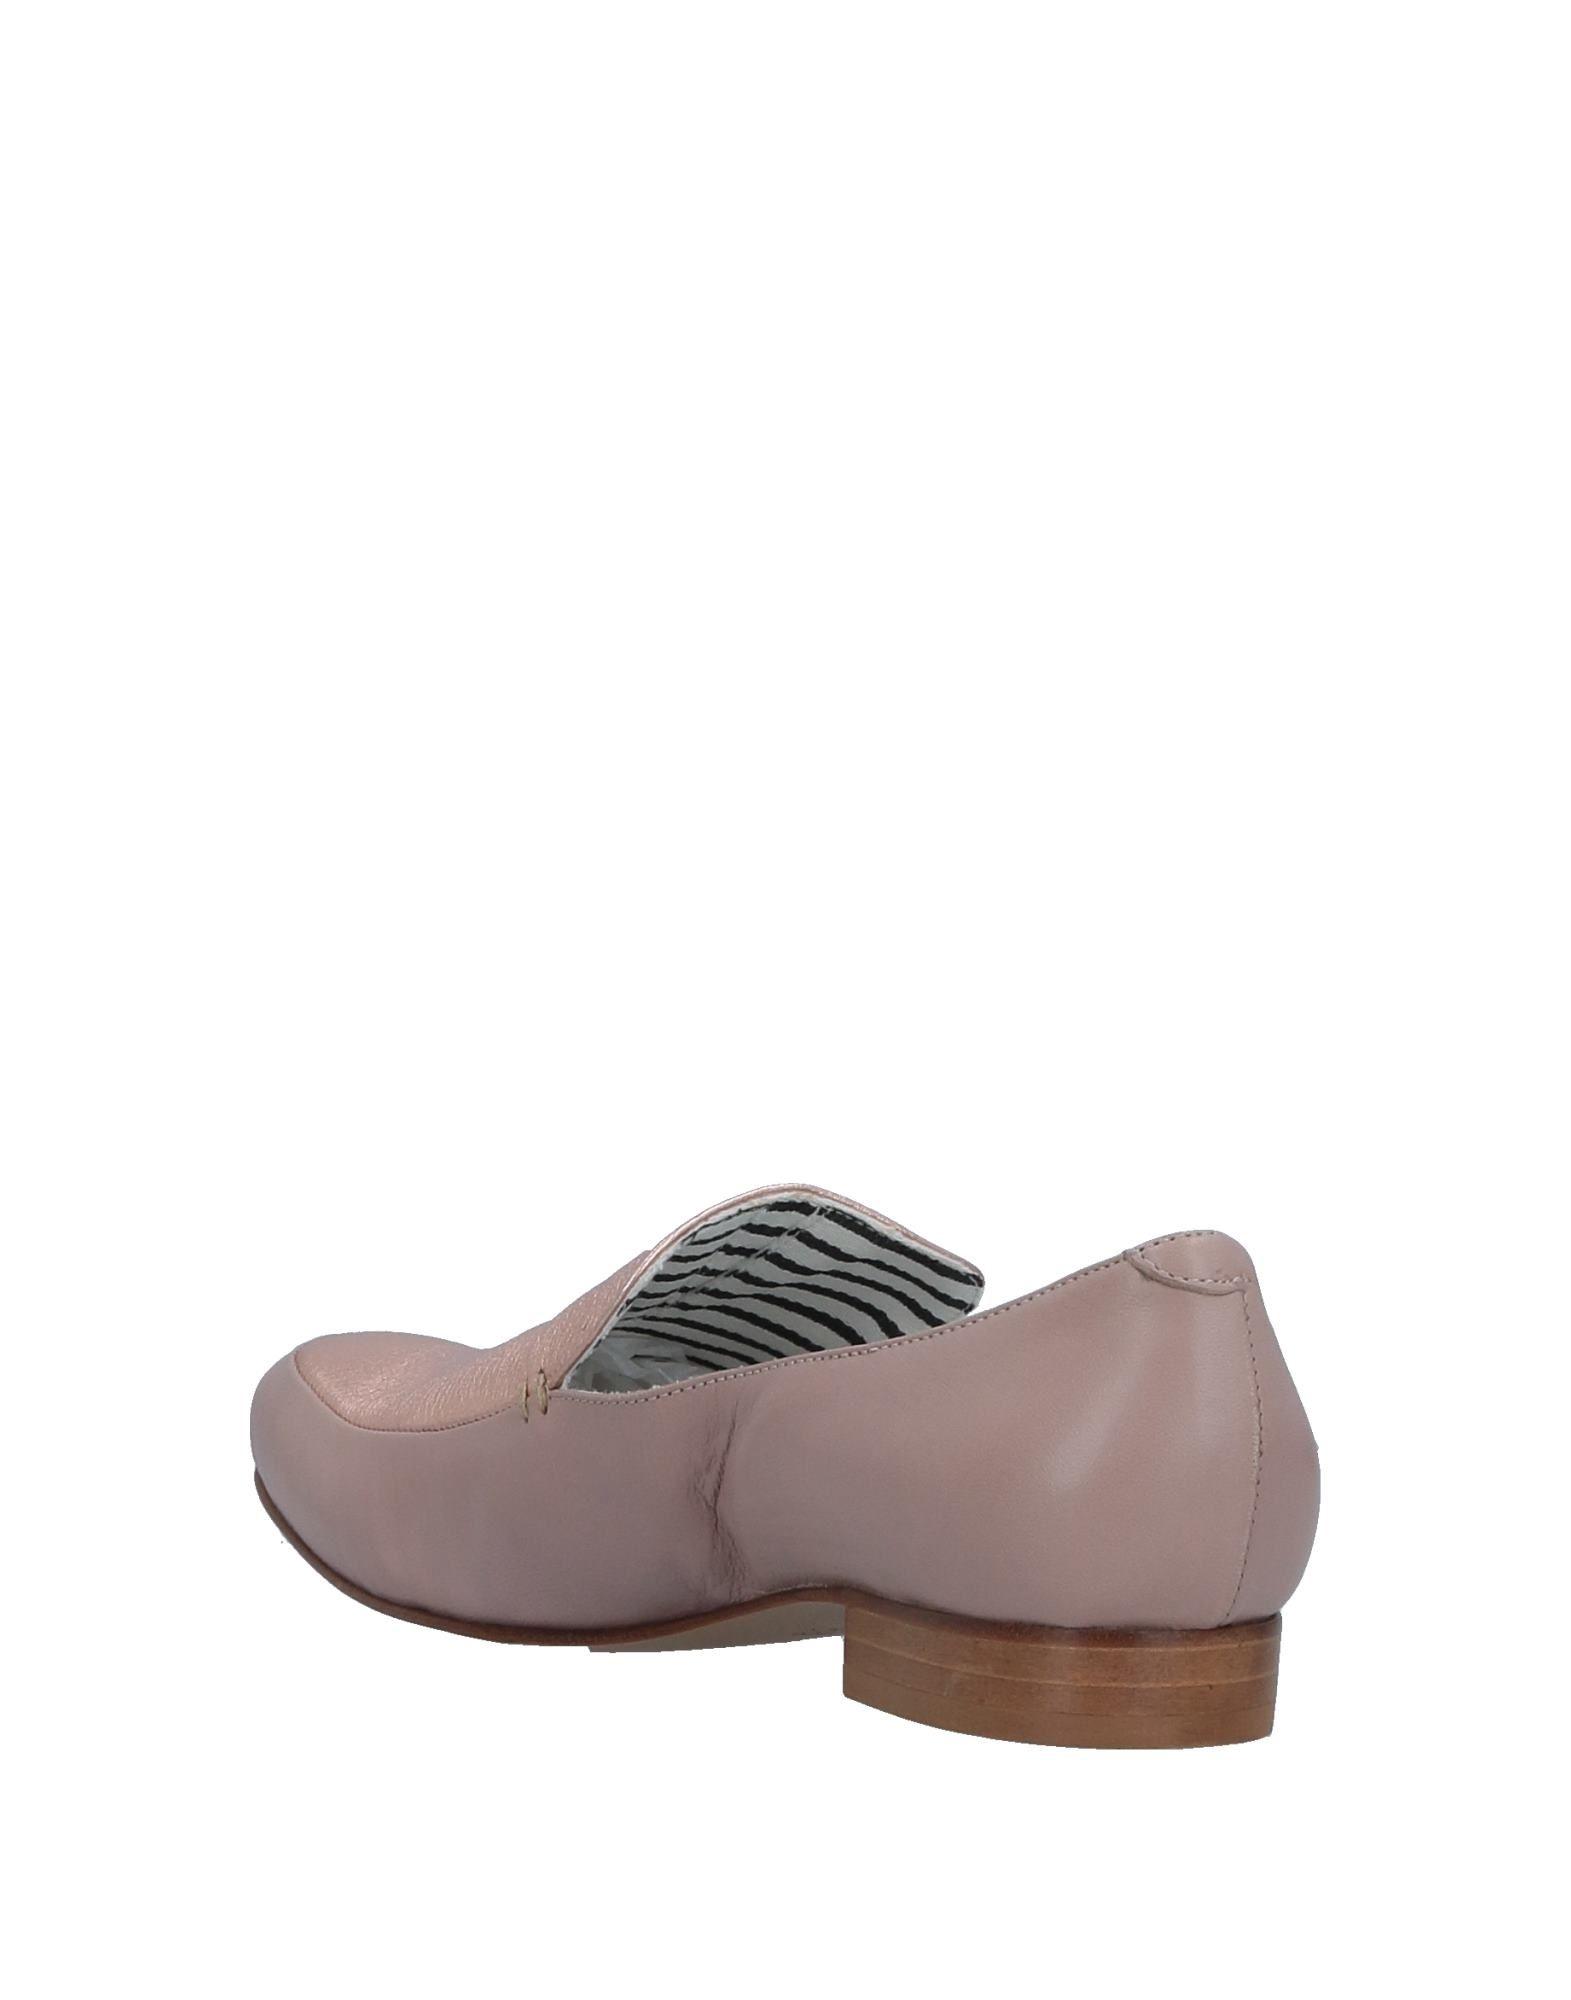 Stilvolle billige Schuhe Damen Alysi Mokassins Damen Schuhe  11521669XE 367d24